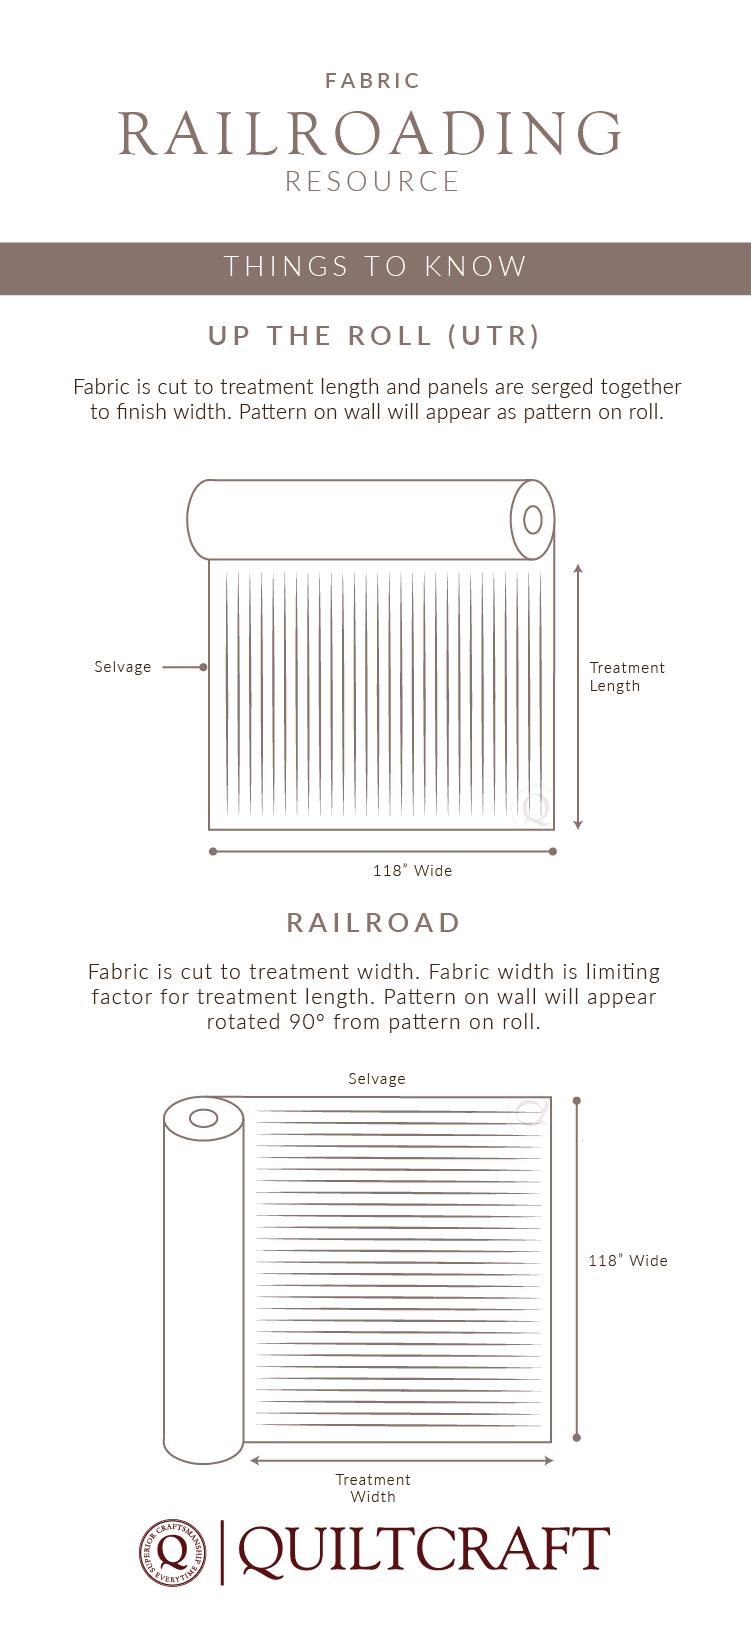 Railroading Fabric